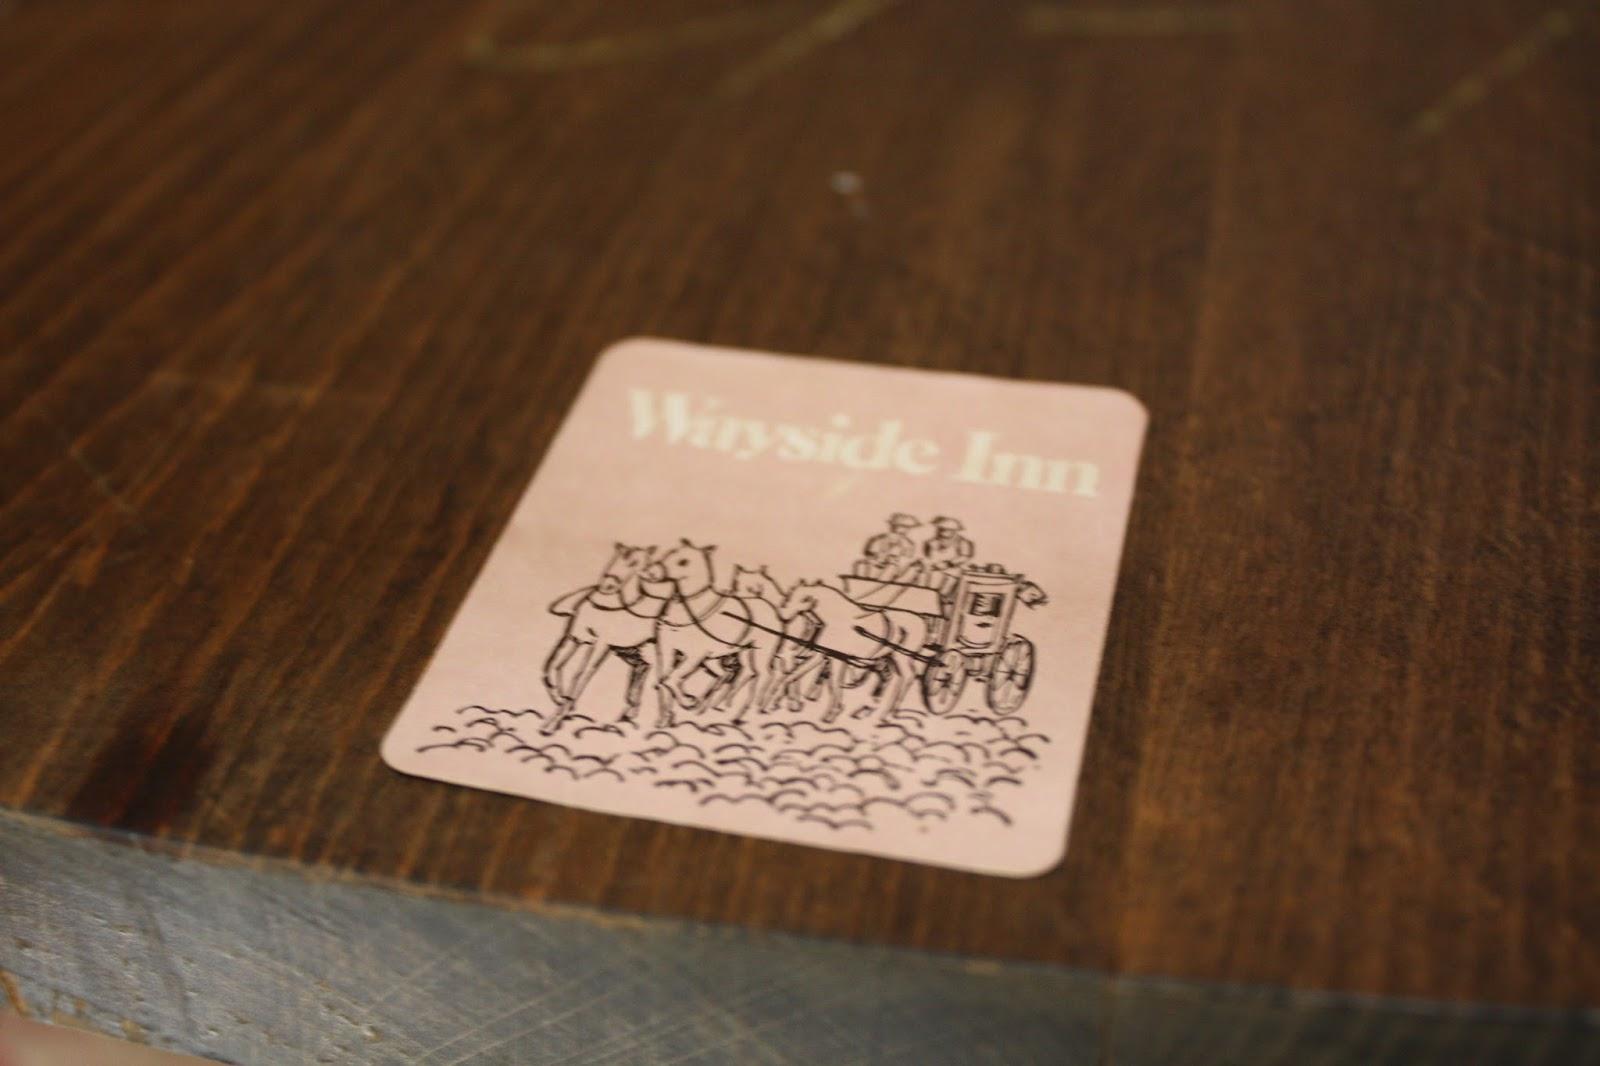 Wayside Inn label